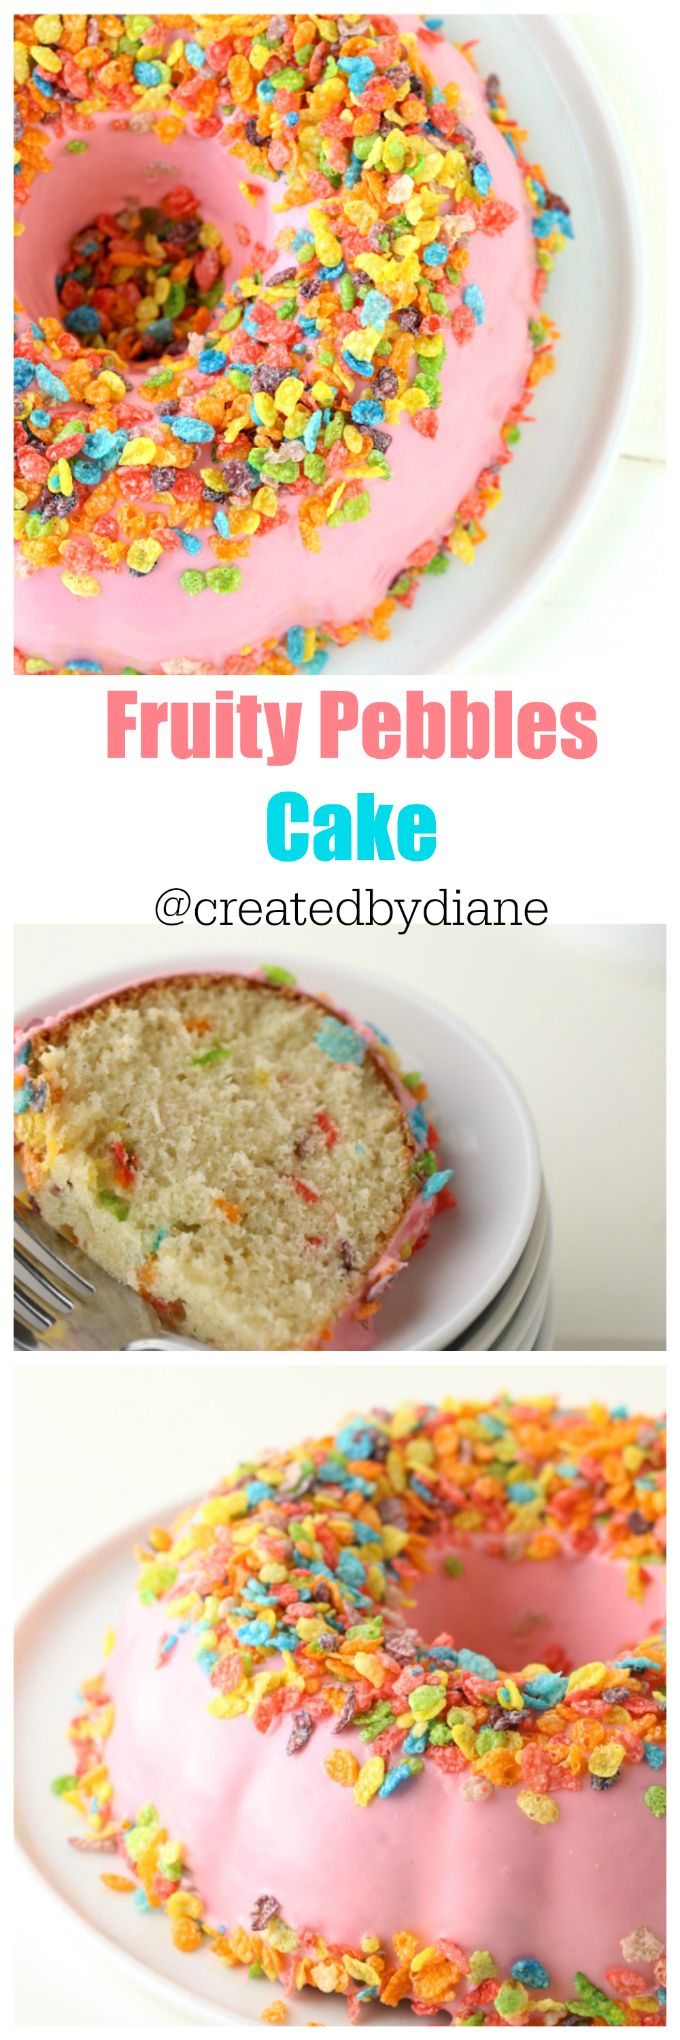 fruity-pebbles-cereal-cake-createdbydiane